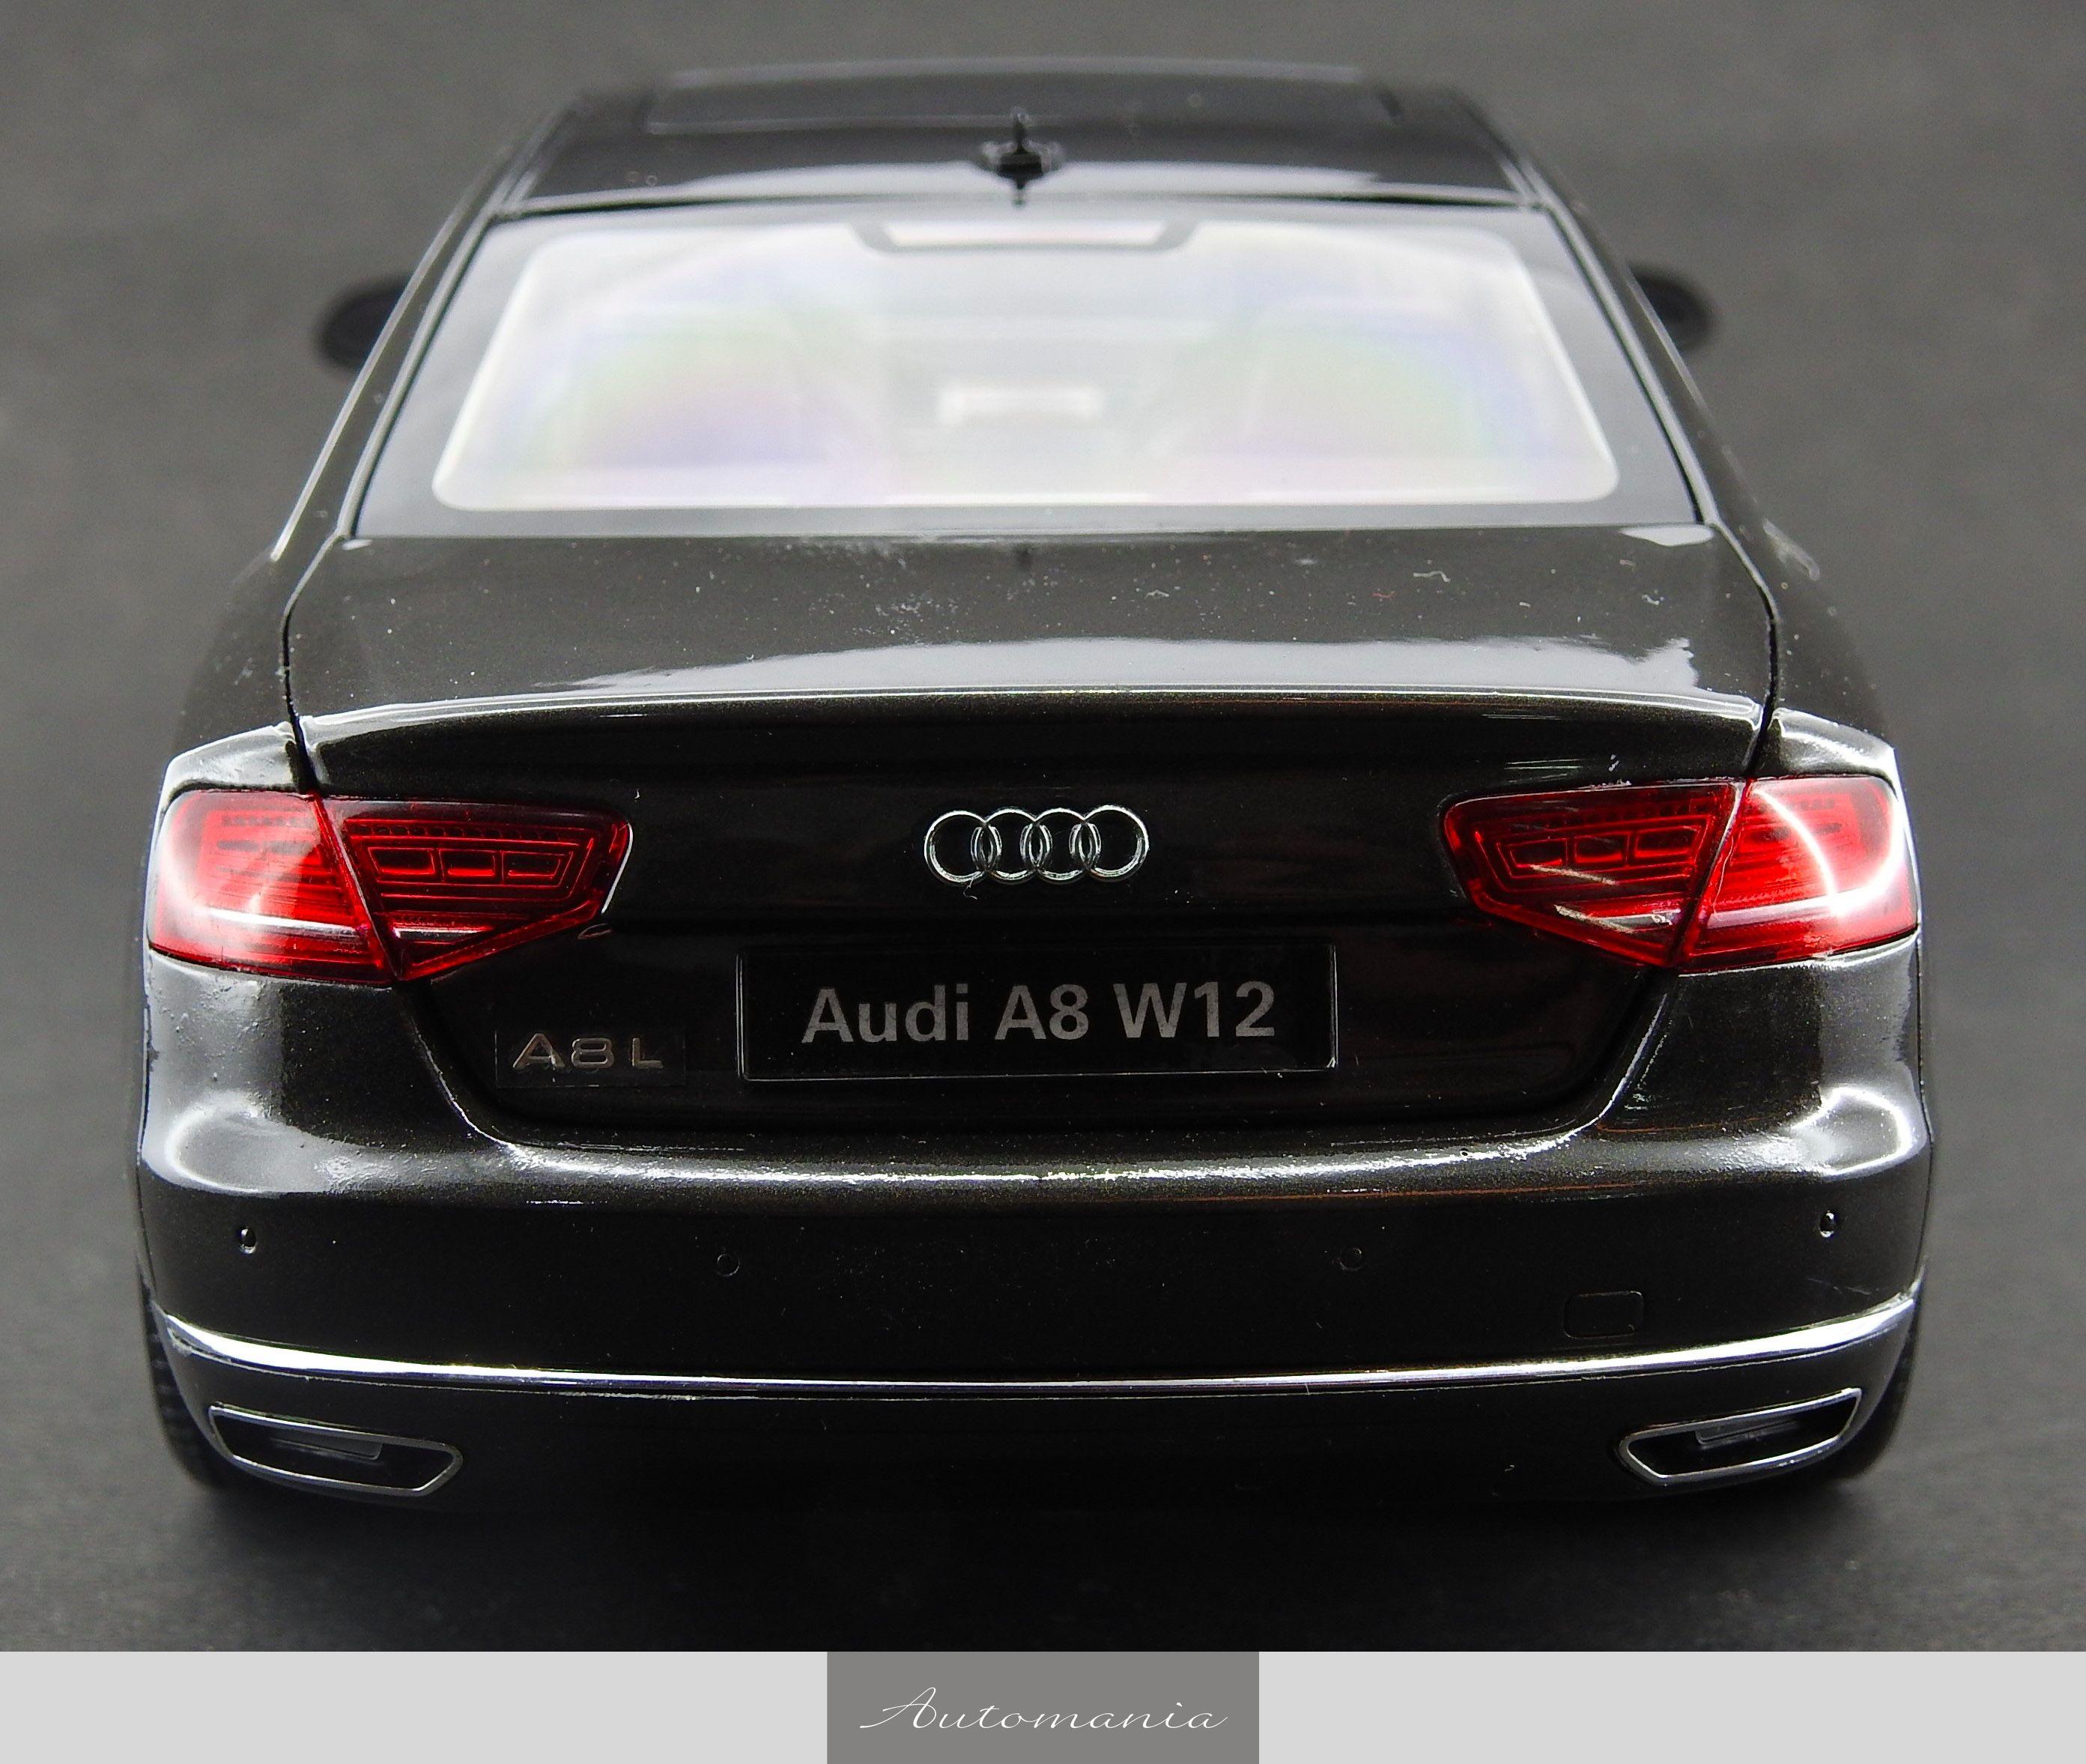 Audi A8 W12 2010 Oolong Grey